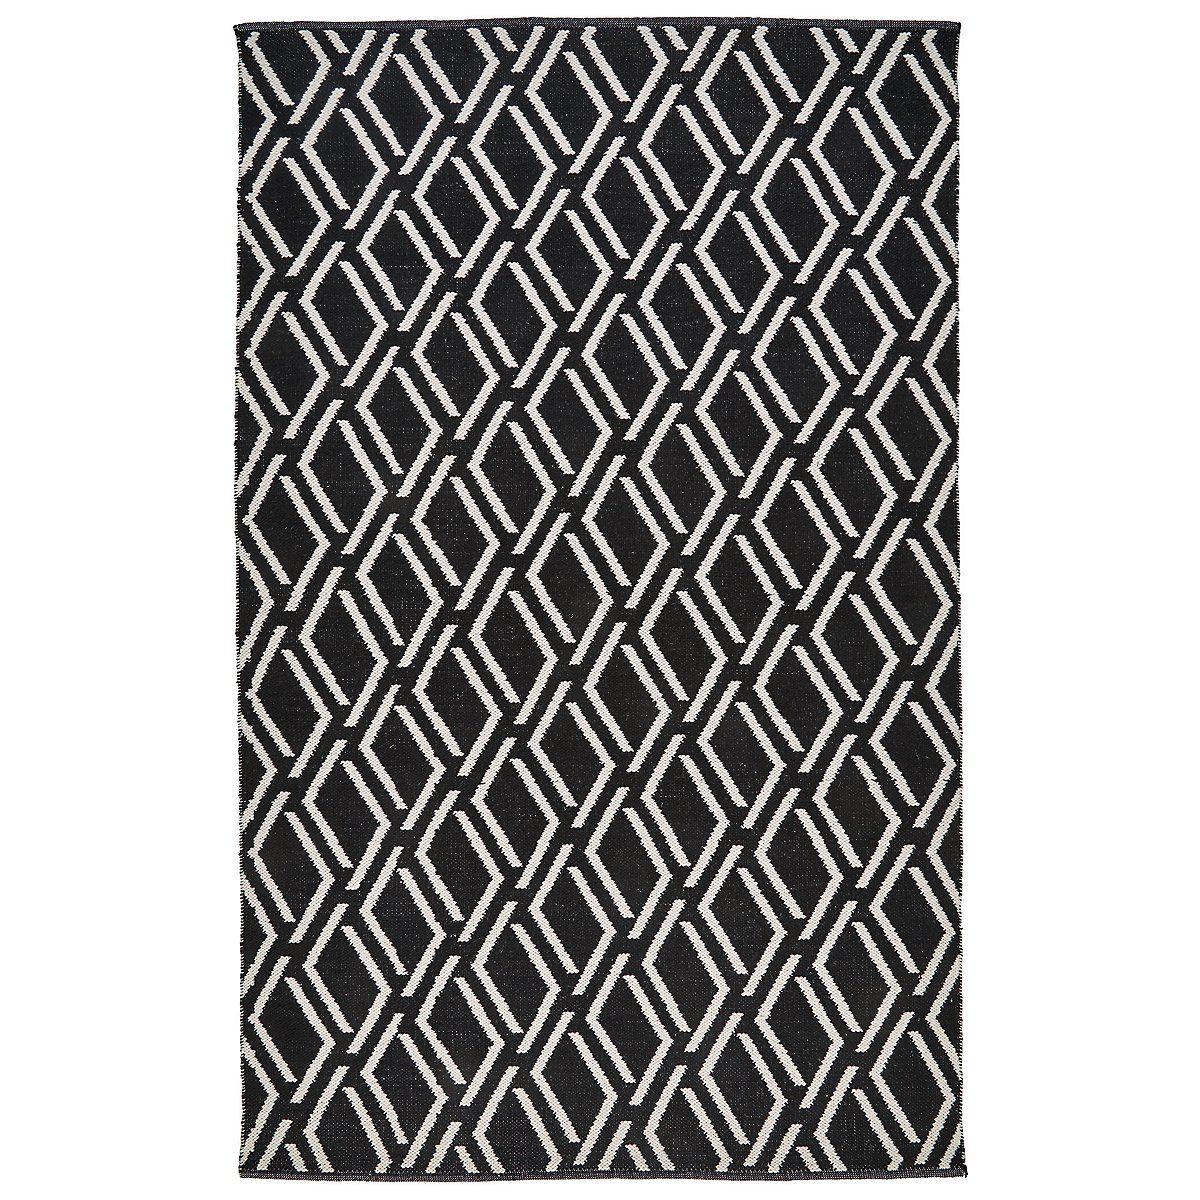 Coast Black Poly Indoor Outdoor 8x10 Area Rug Rug Pattern Rugs